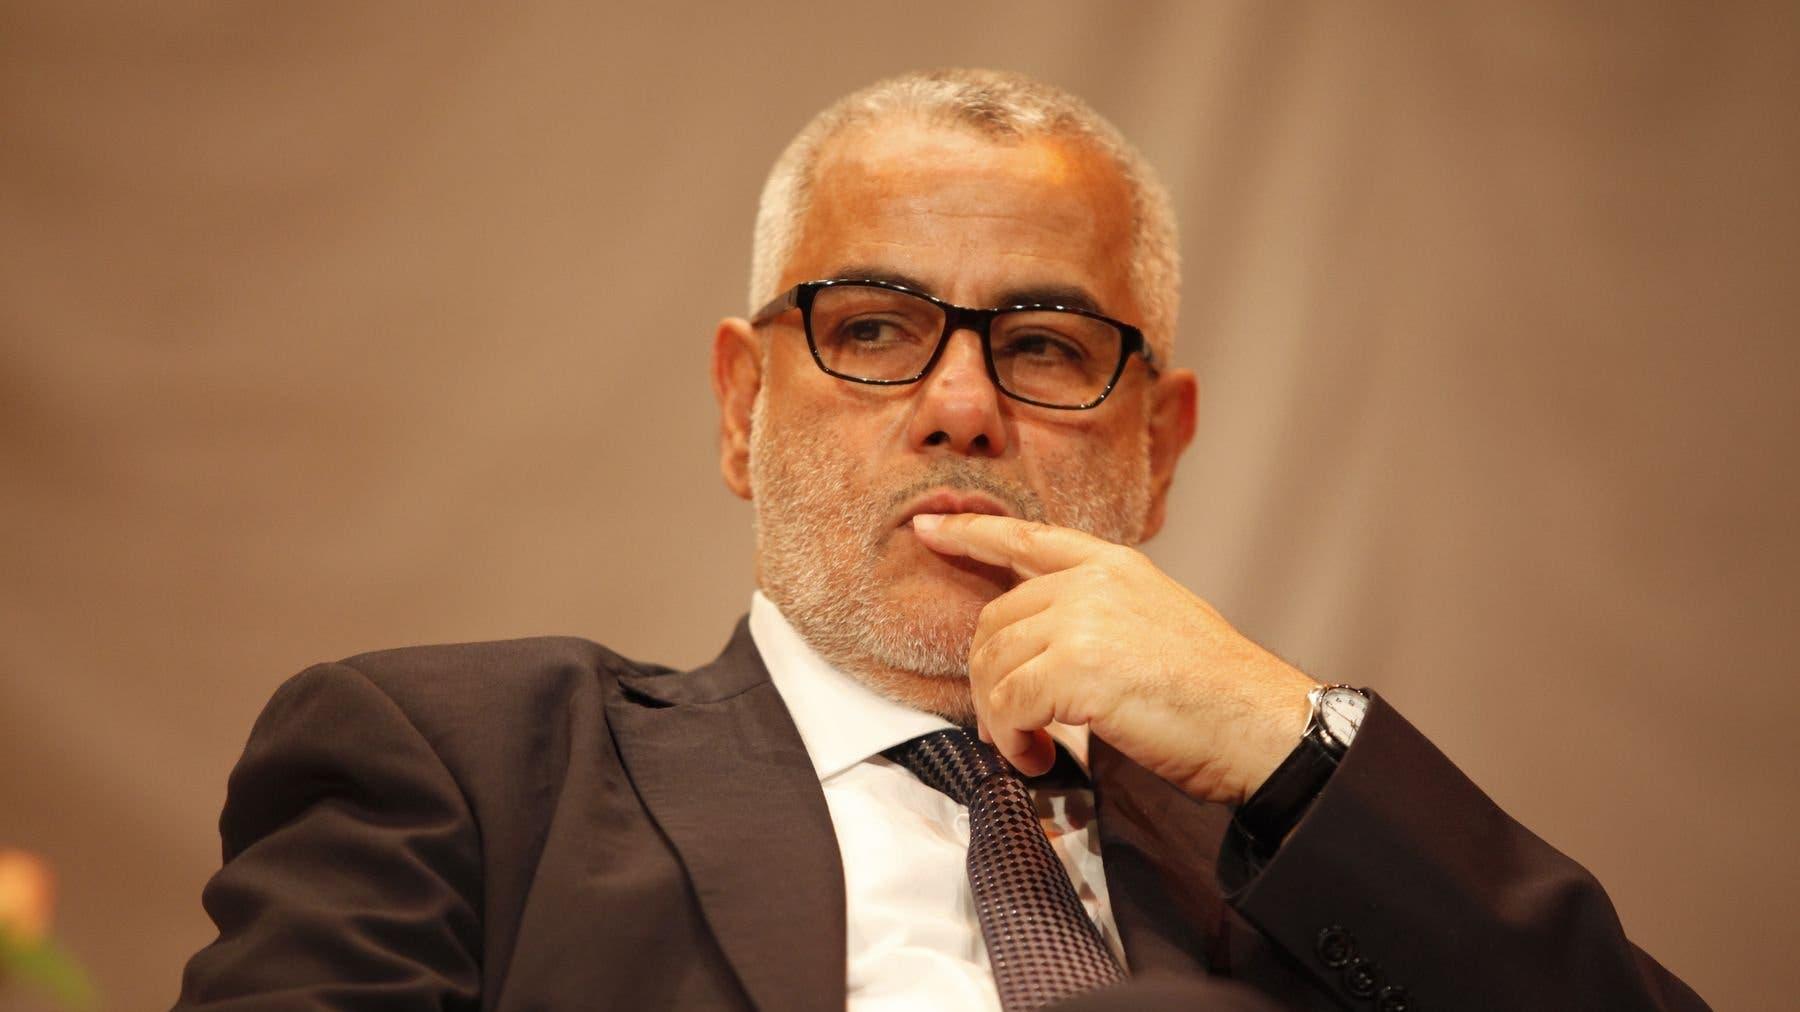 Photo of امكراز: وجهنا الدعوة لبنكيران لحضور ملتقى الشبيبة لكنه اعتذر